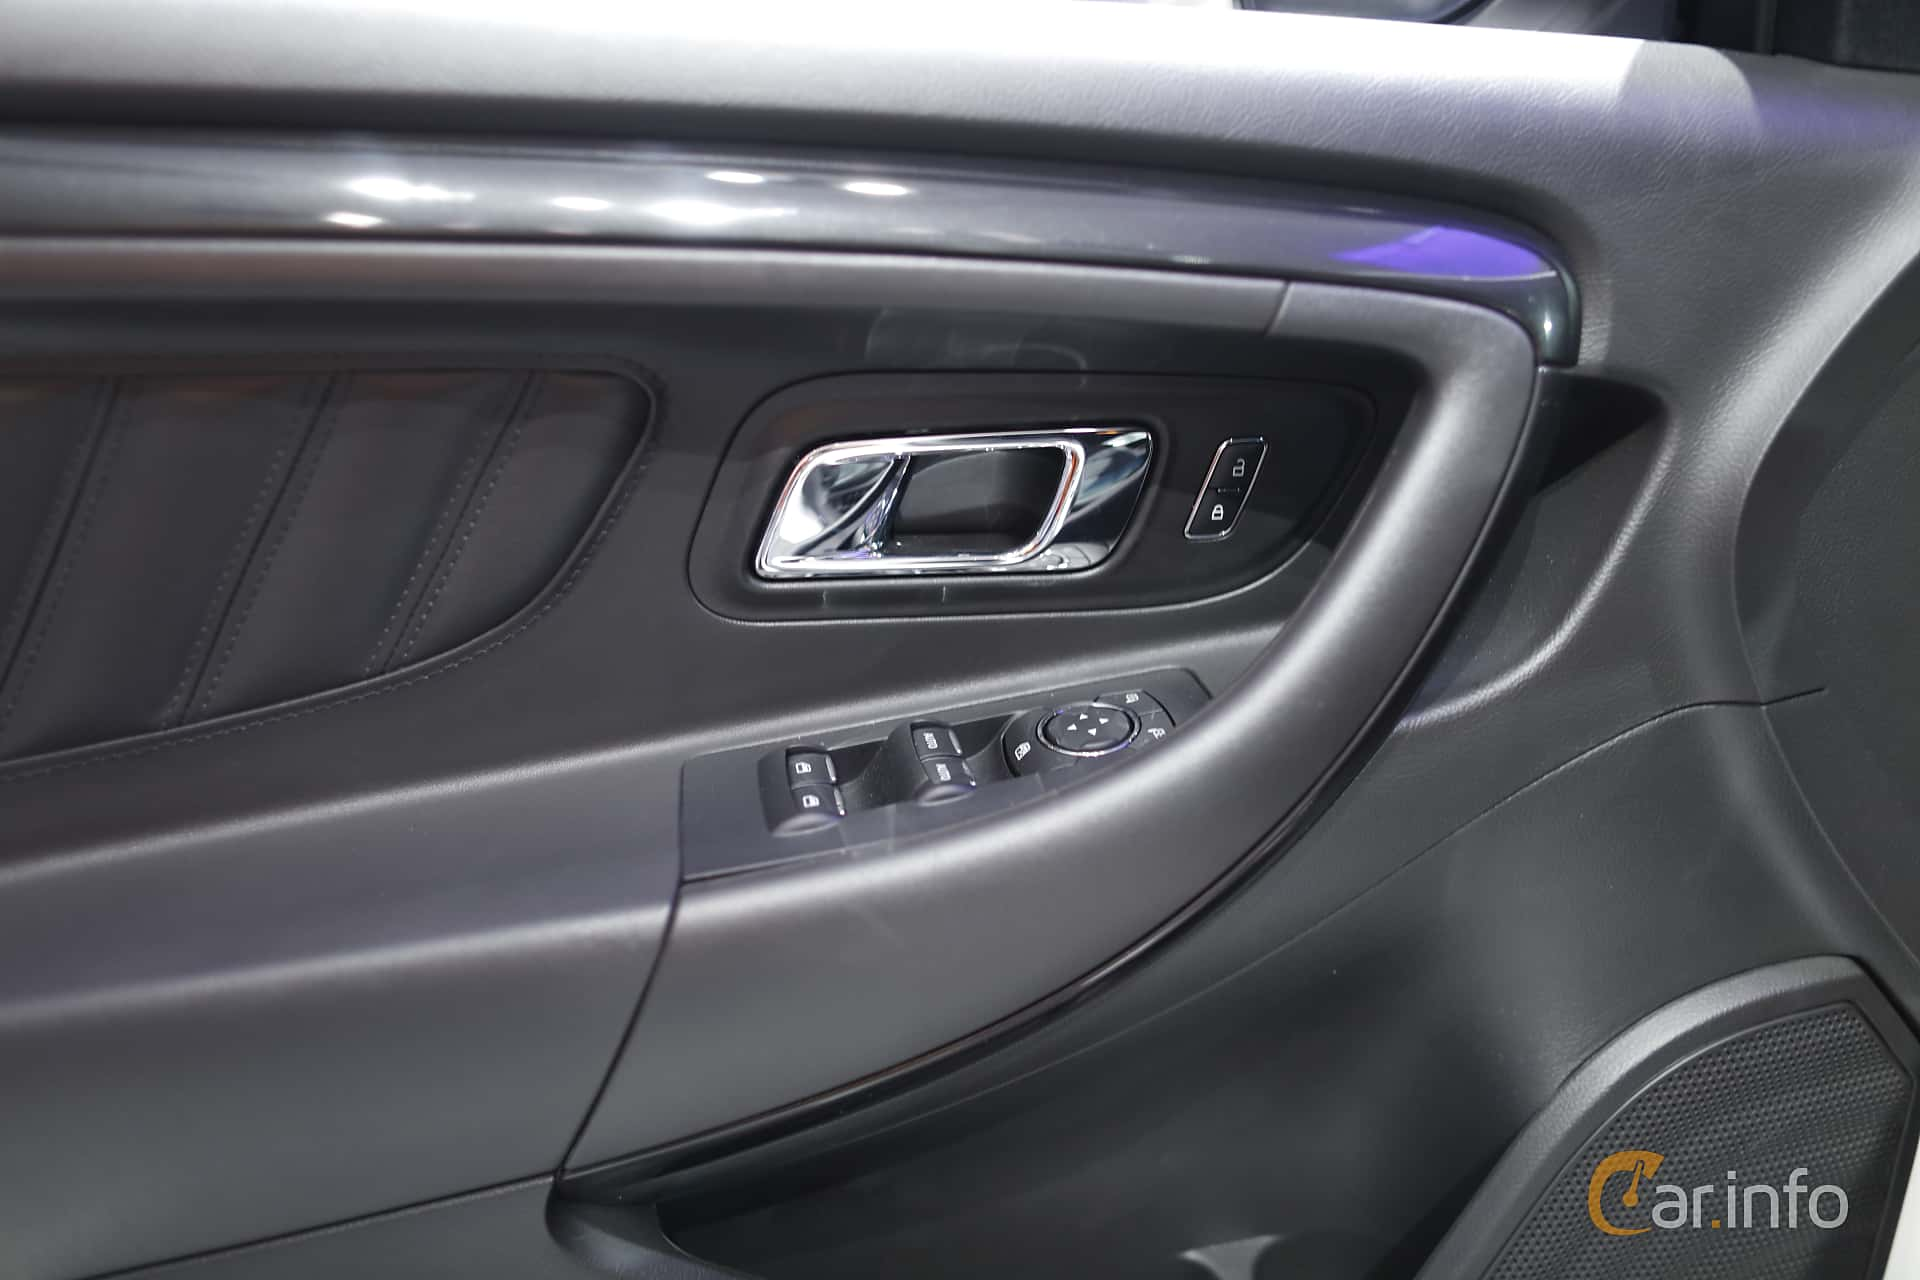 Ford Taurus SHO 3.5 V6 Ecoboost 4x4 SelectShift, 370hp, 2017 at North American International Auto Show 2017